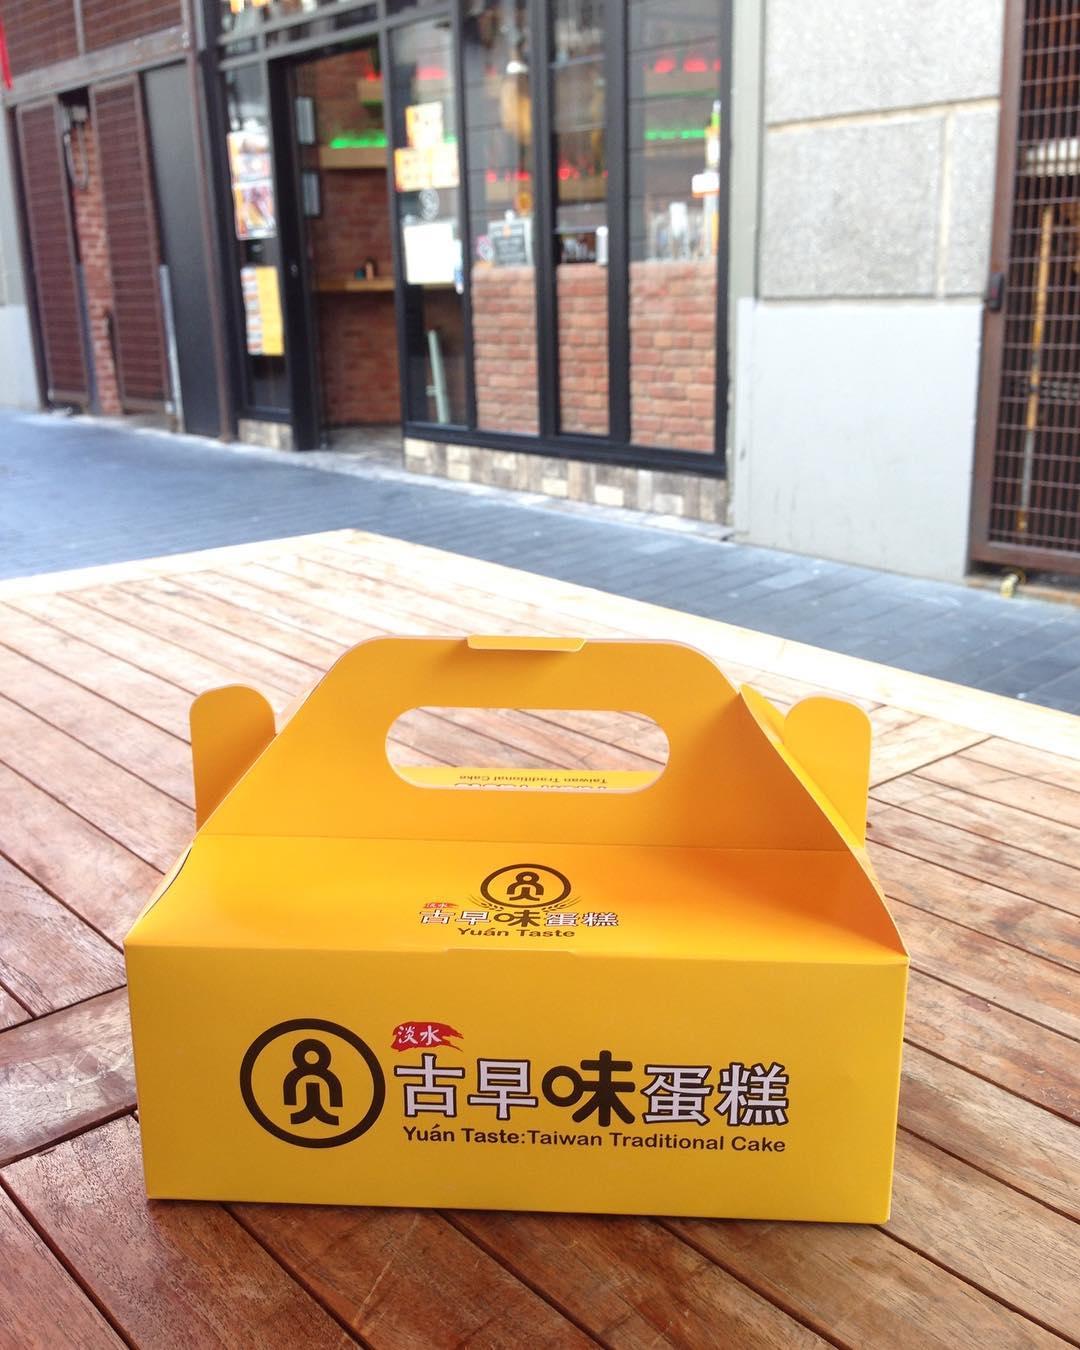 Yuan Taste Taiwan Traditional Cake Menu